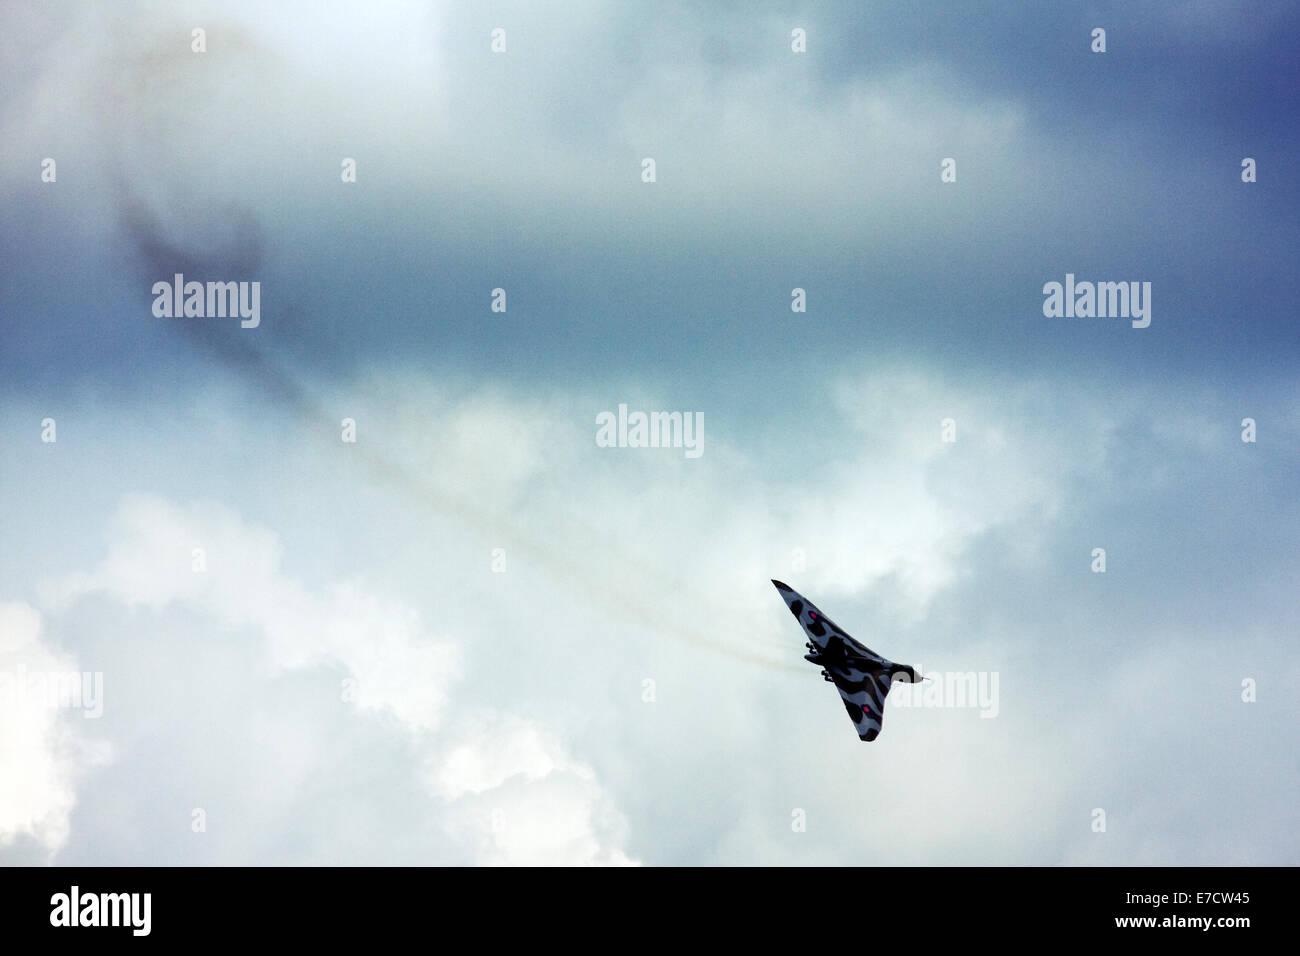 Avro 698 Vulcan B2  strategic bomber display at Farnborough International Airshow 2014 - Stock Image